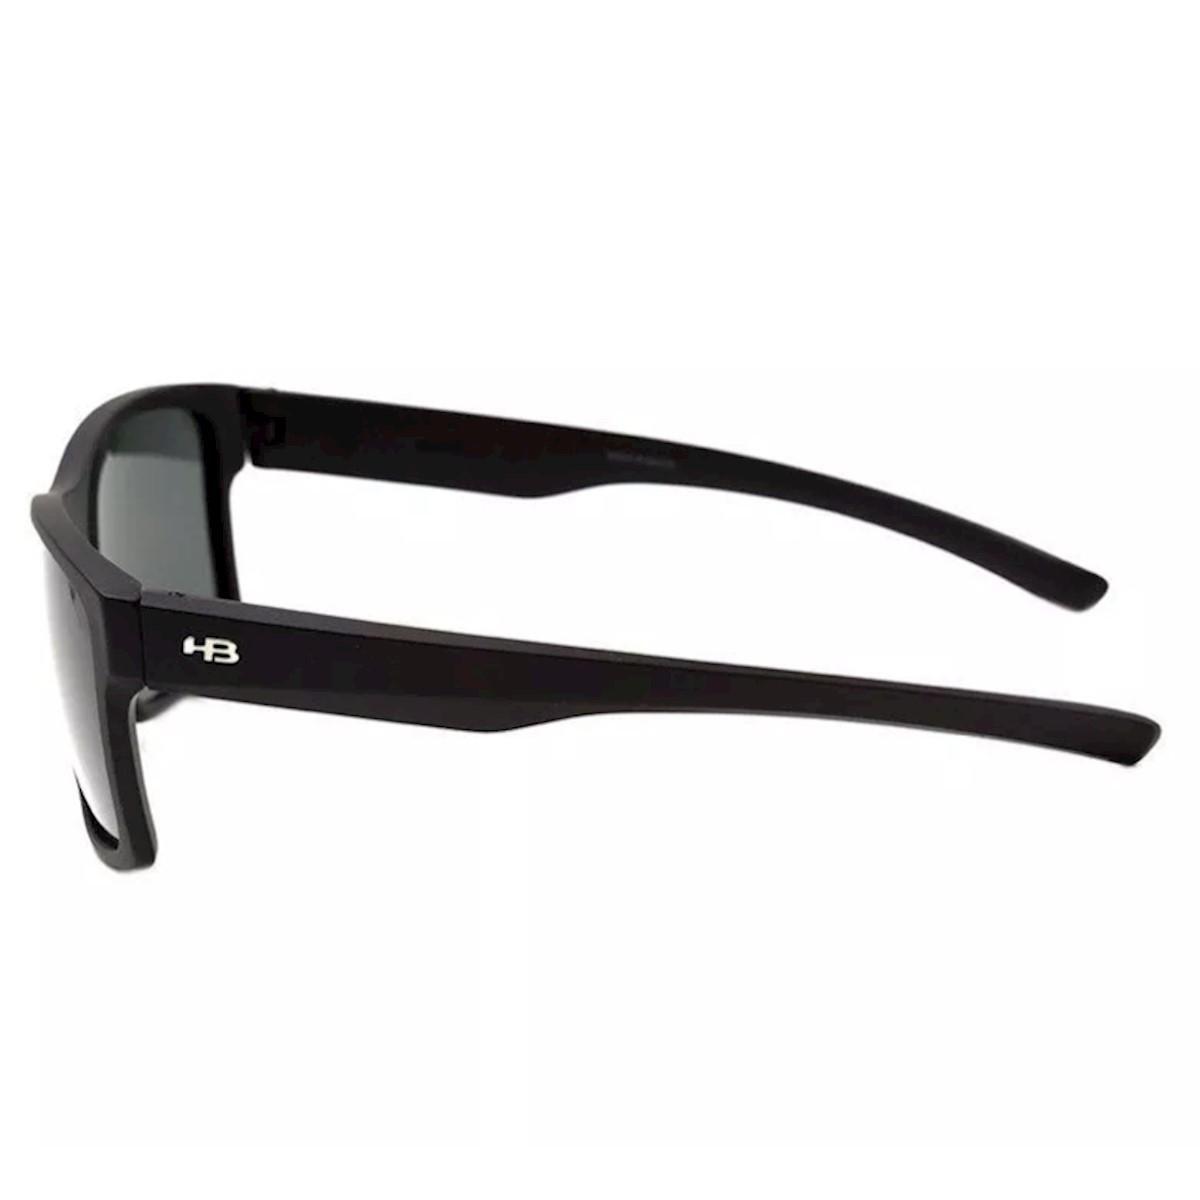 d6063c9e961e7 Óculos de Sol HB Freak Matte Gray Polarized - Preto - Compre Agora ...